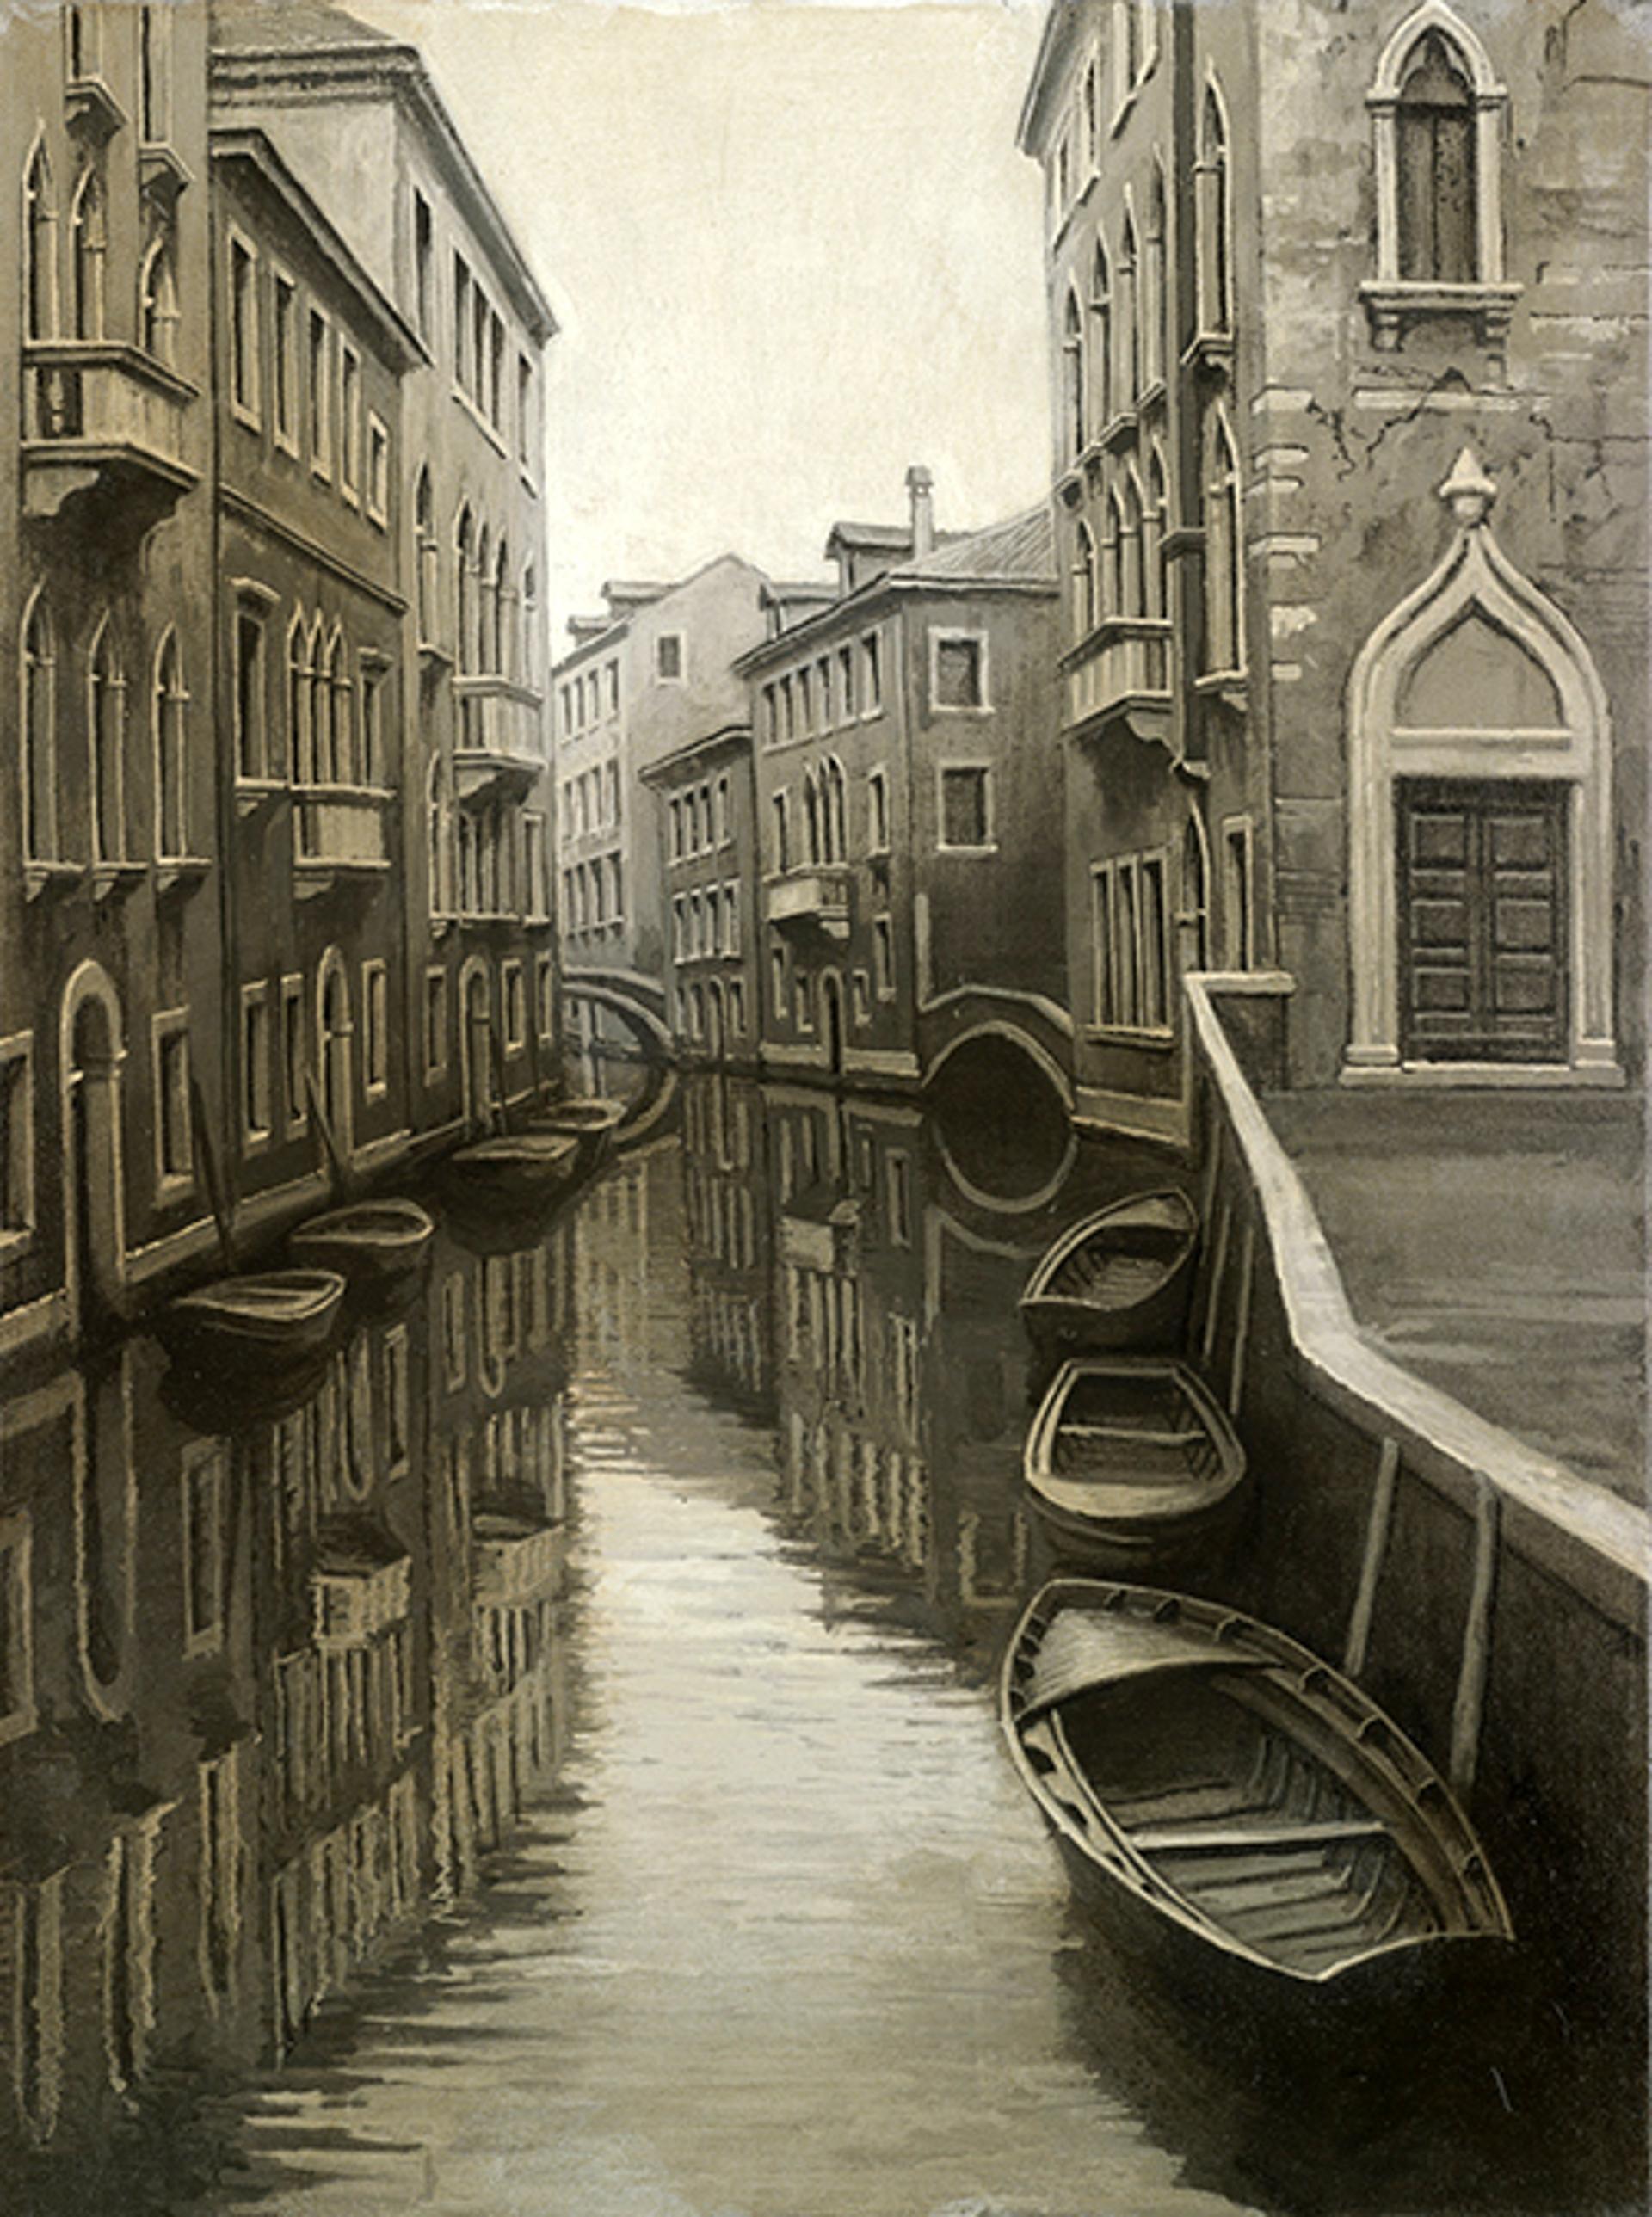 Venezia by Alexei Butirskiy